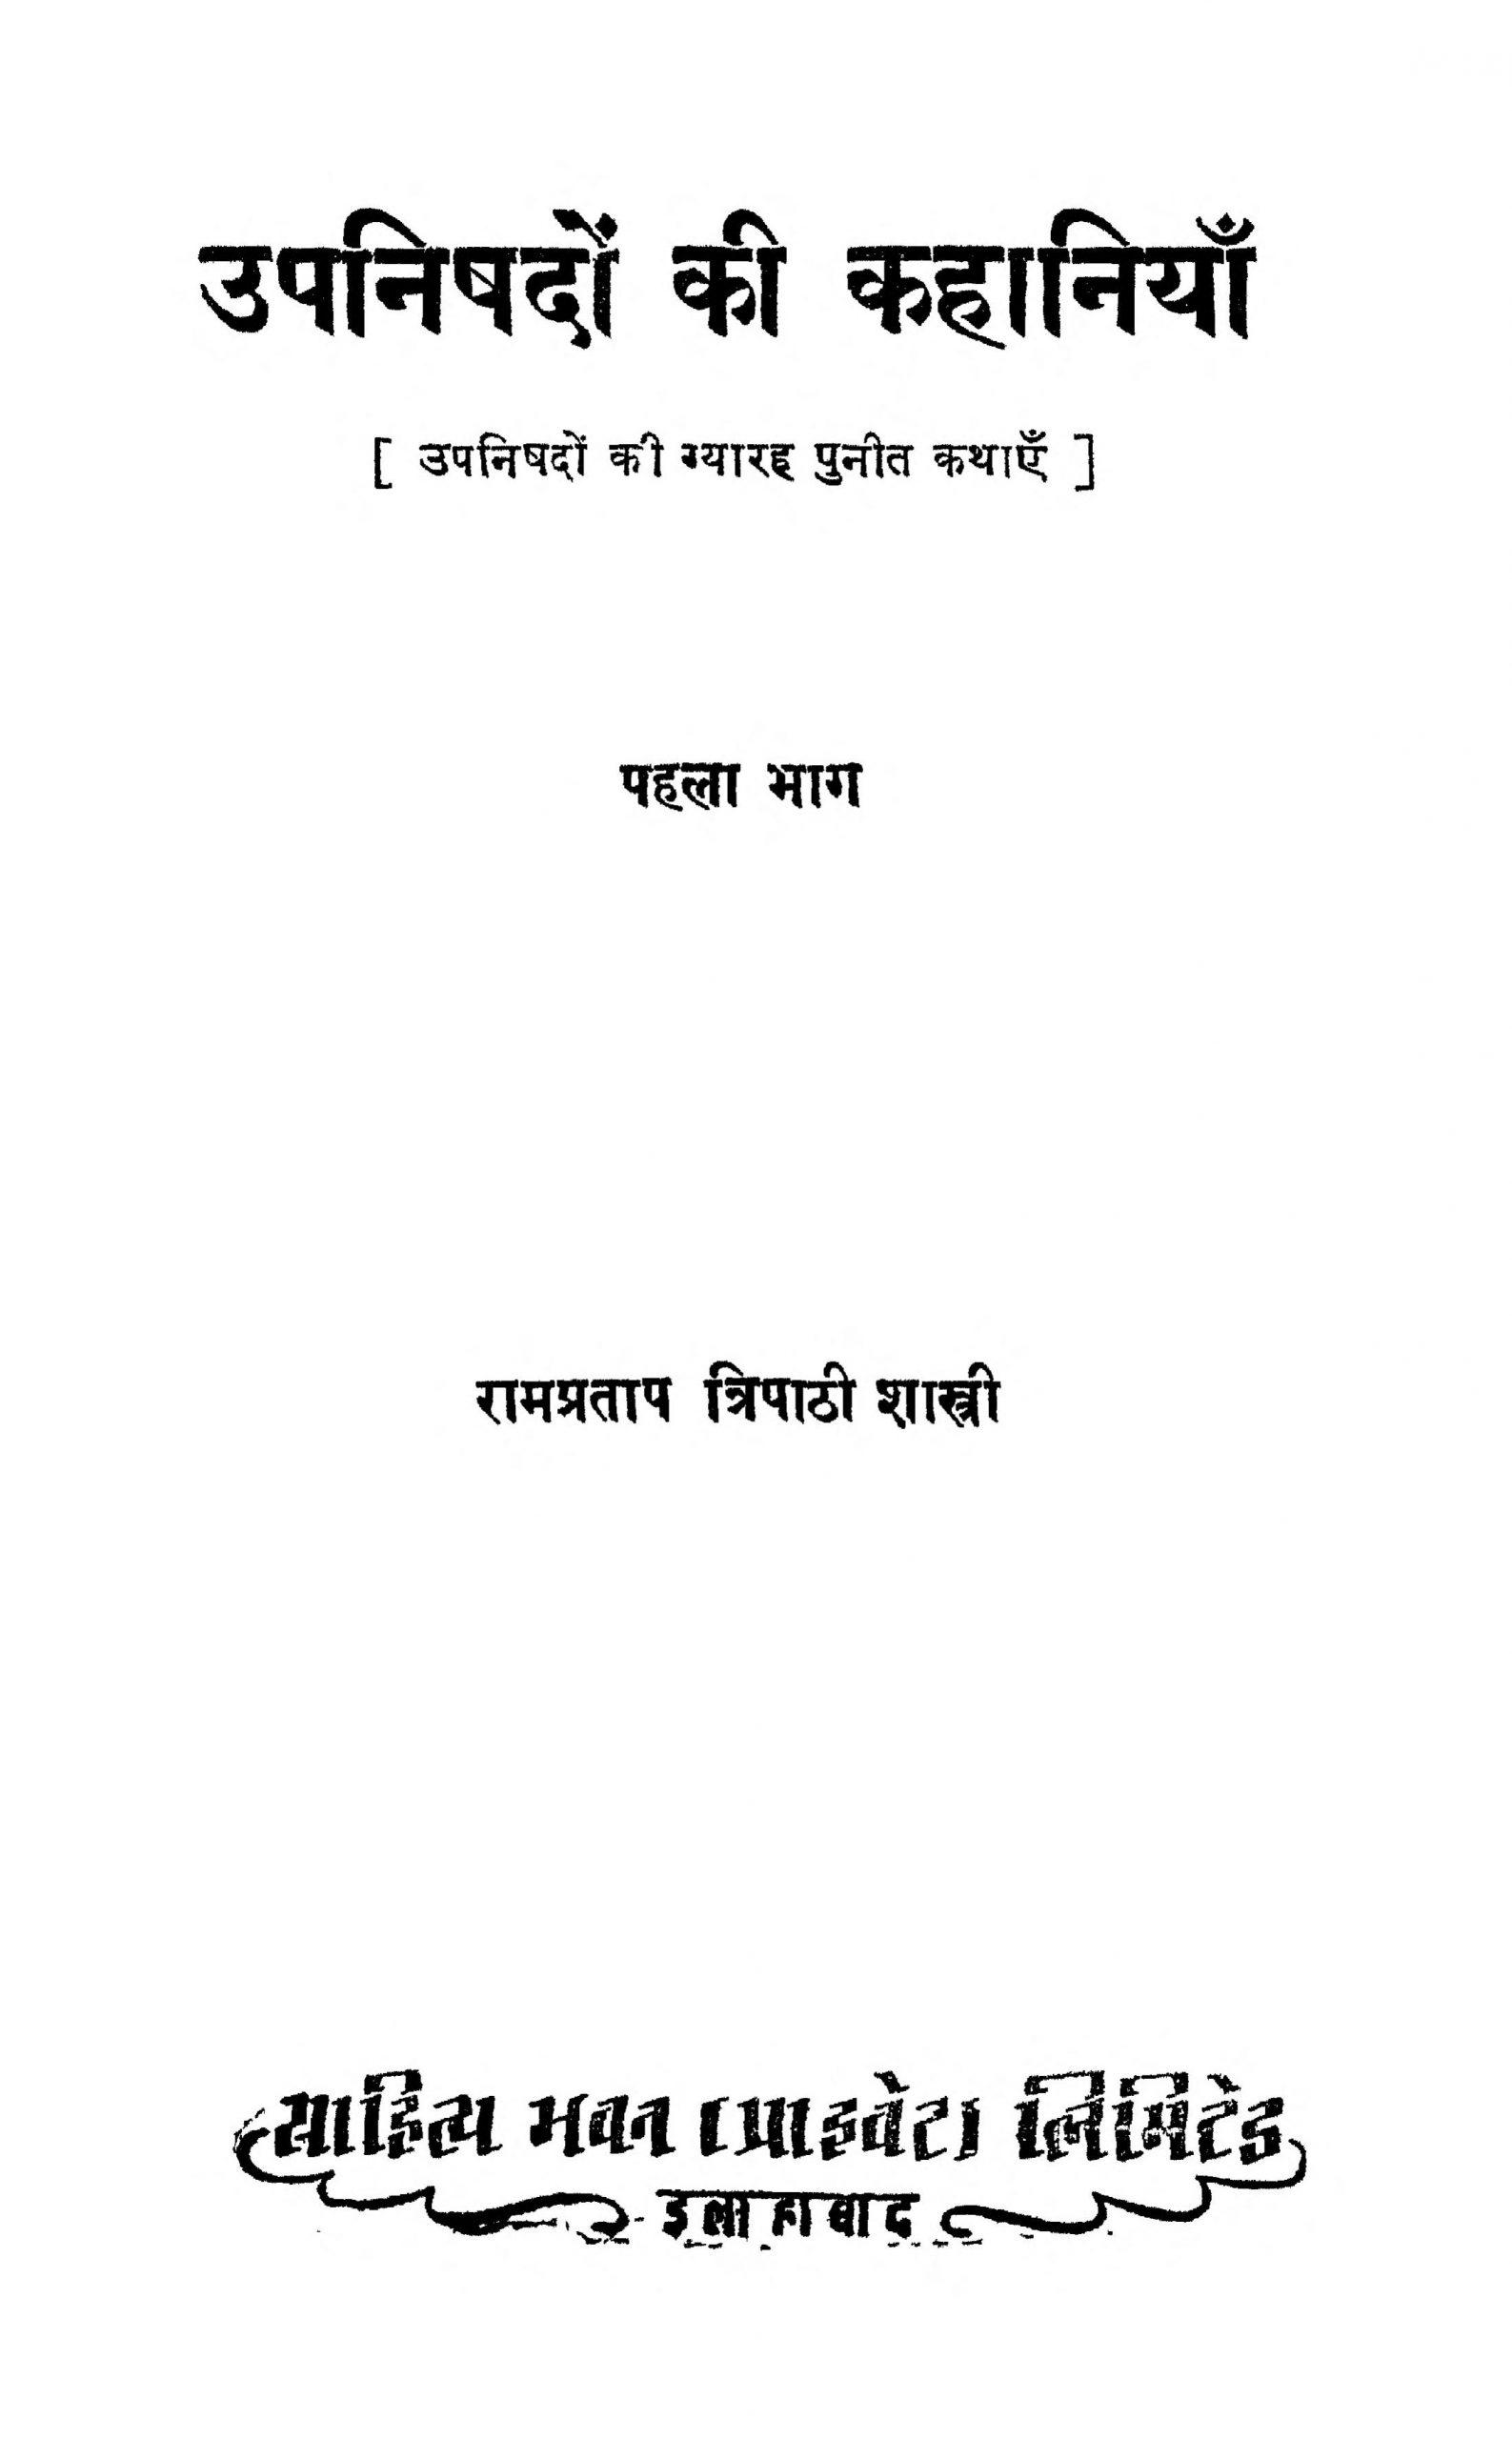 Upanishhadon Ki Kahaniyan Bhaga 1 by श्री. रामप्रताप त्रिपाठी शास्त्री - Shree Rampratap Tripati Shastri